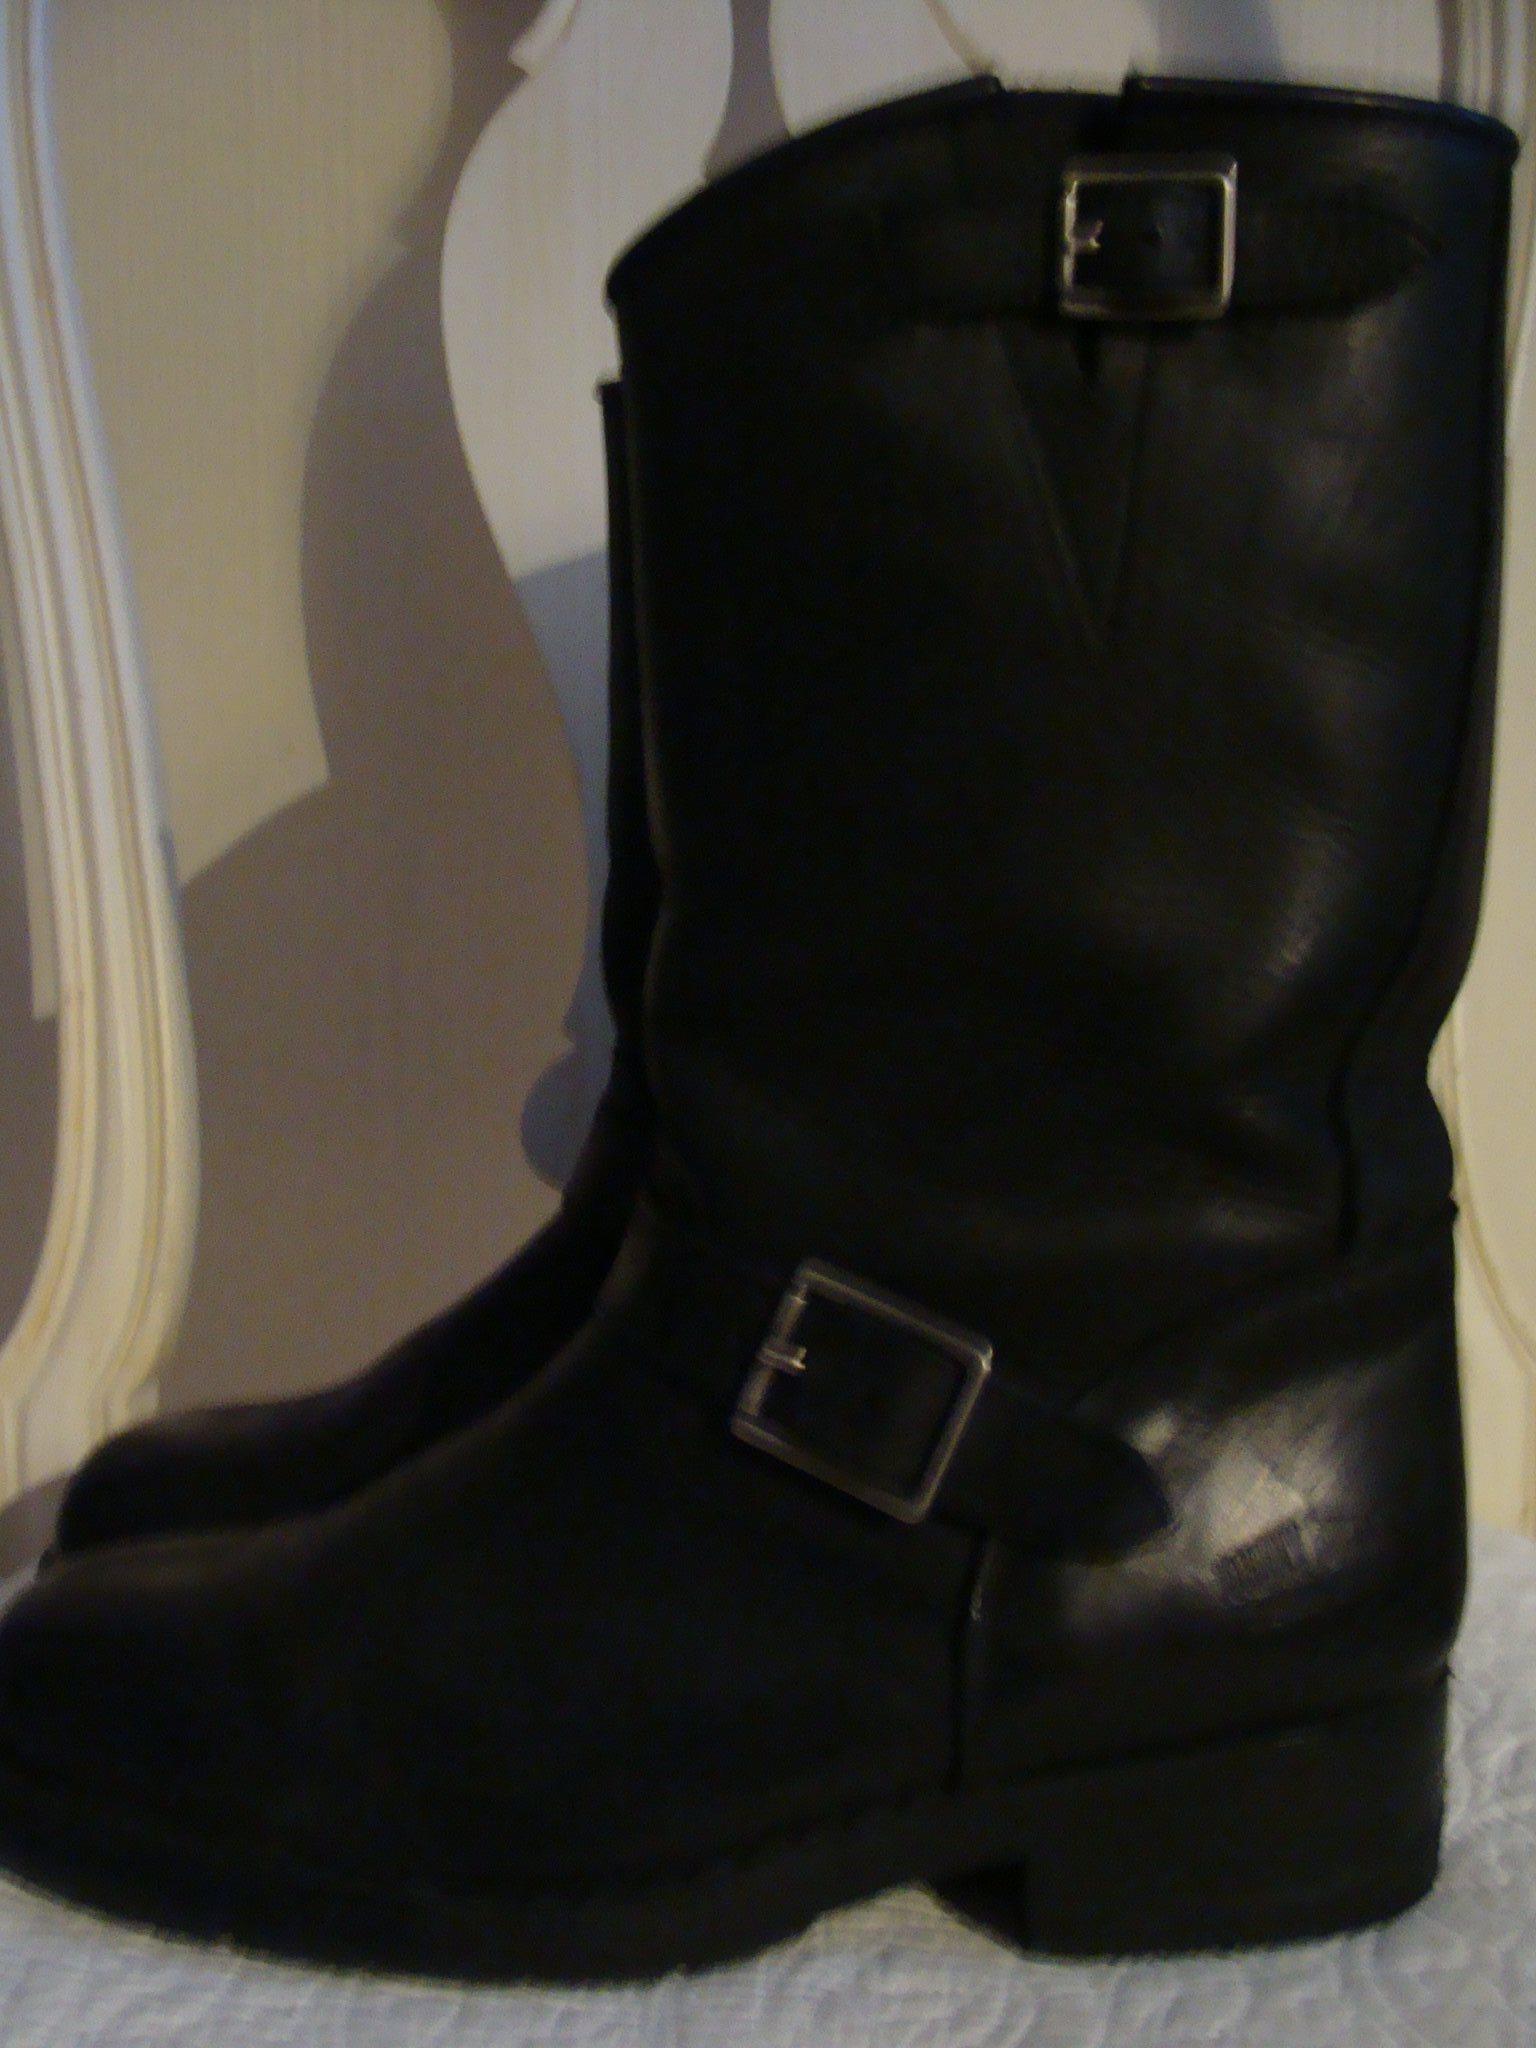 KÄNGOR JOHNNY BULLS 38 svarta skinn boots Mc . (335449299) ᐈ Köp på ... 93914cec5d4fd